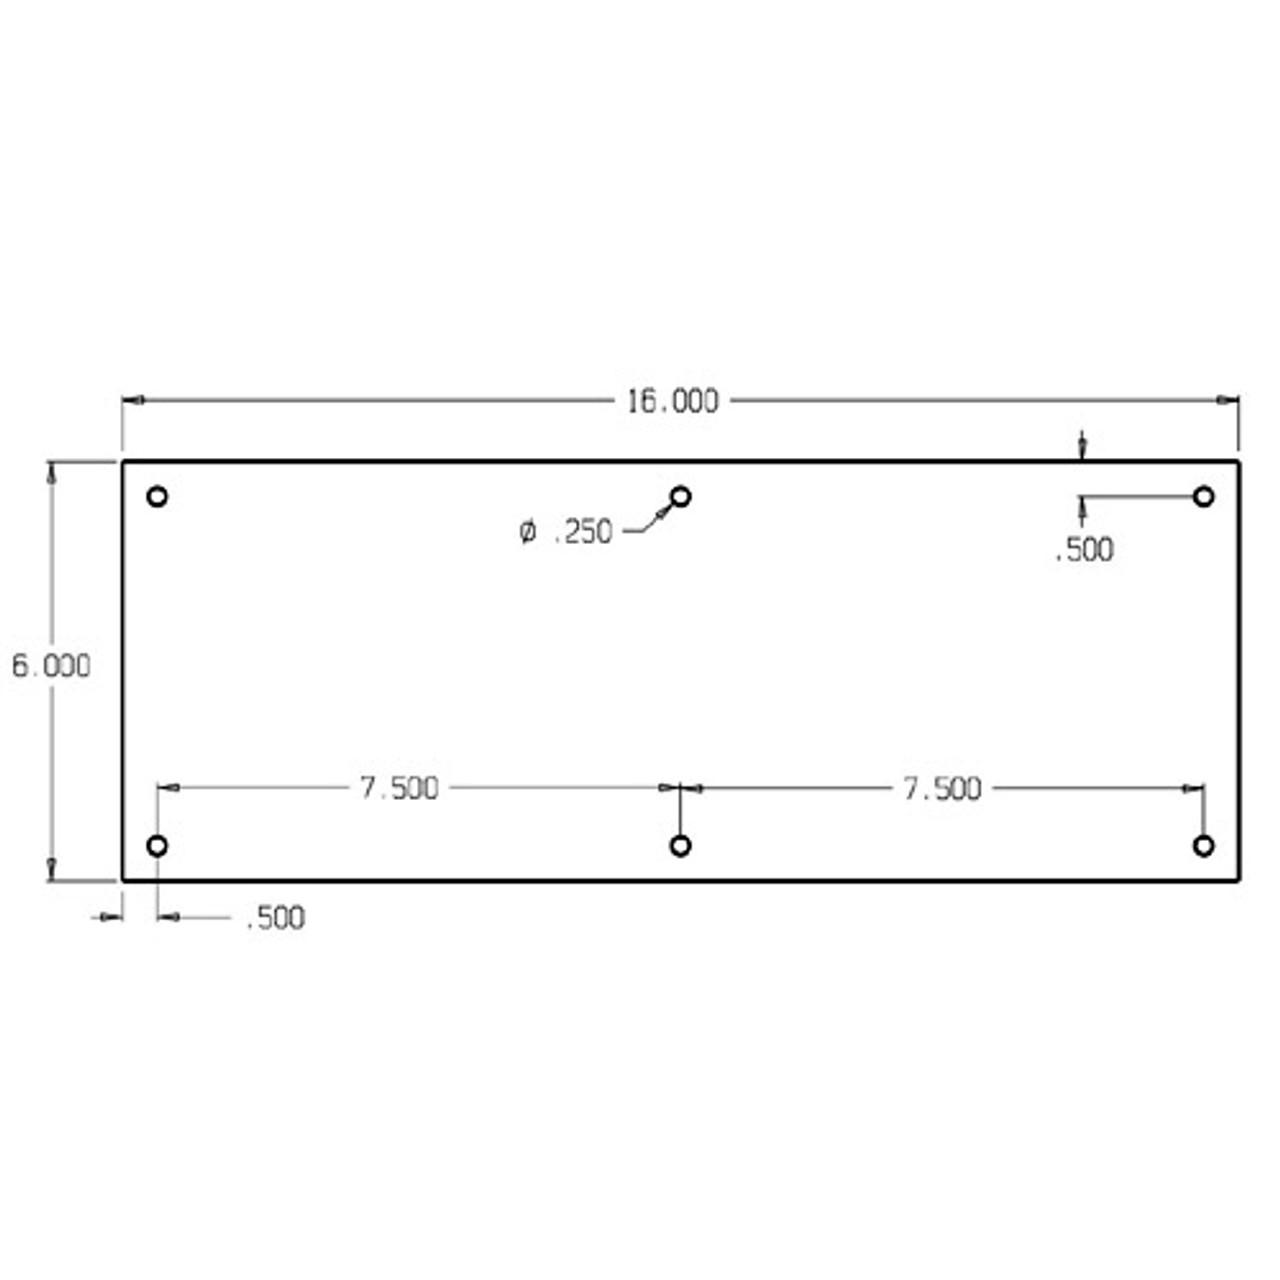 "72-606 Don Jo 0.50 Push Plate in 6 X 16"""